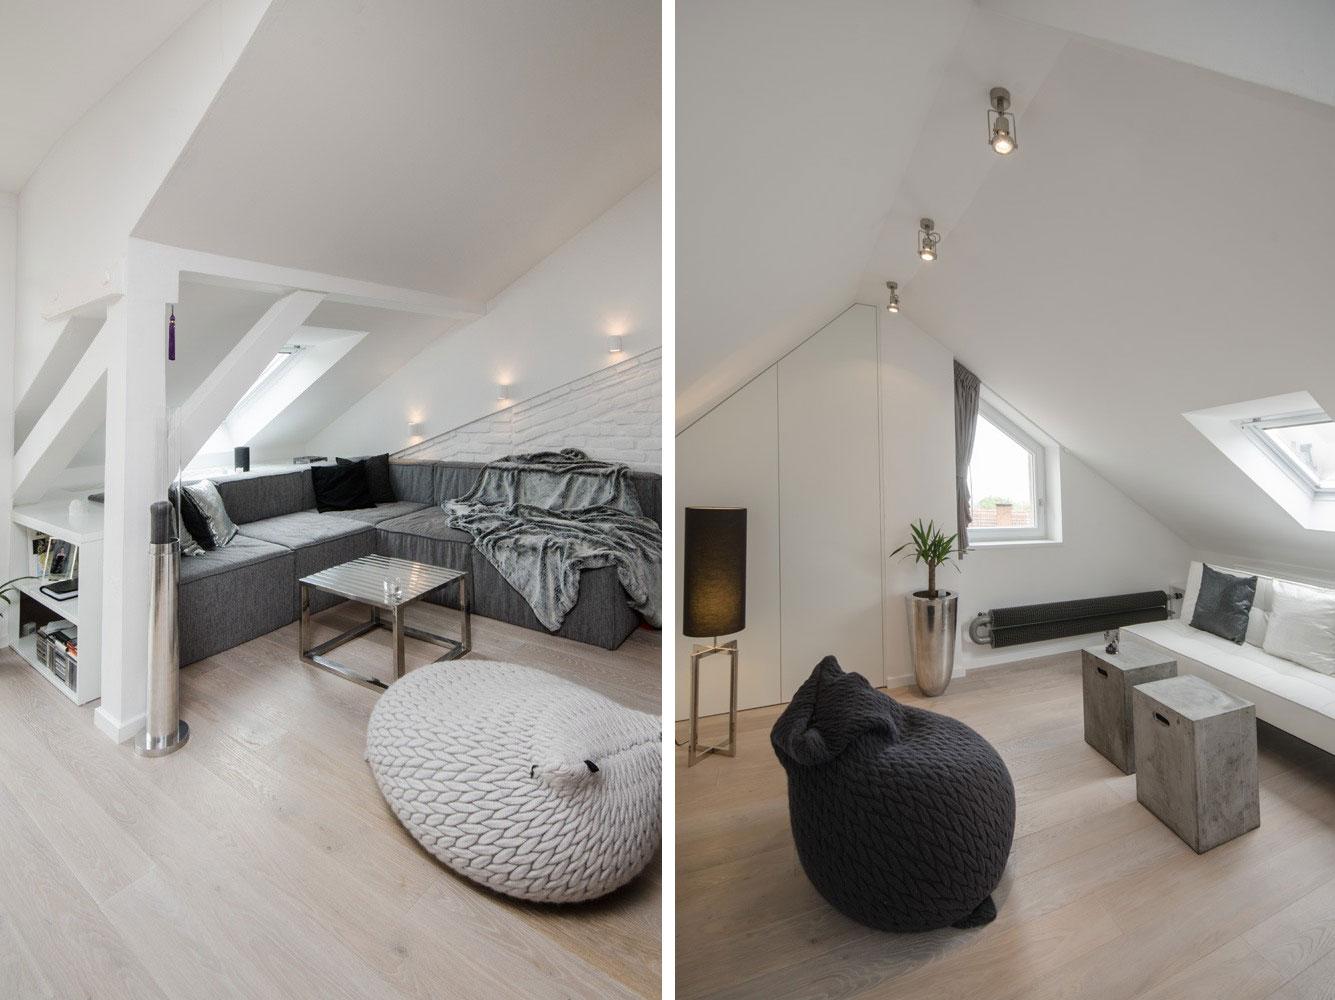 Arquitectura y dise o grey loft by oooox prague czech republic - Arquitectura y diseno ...